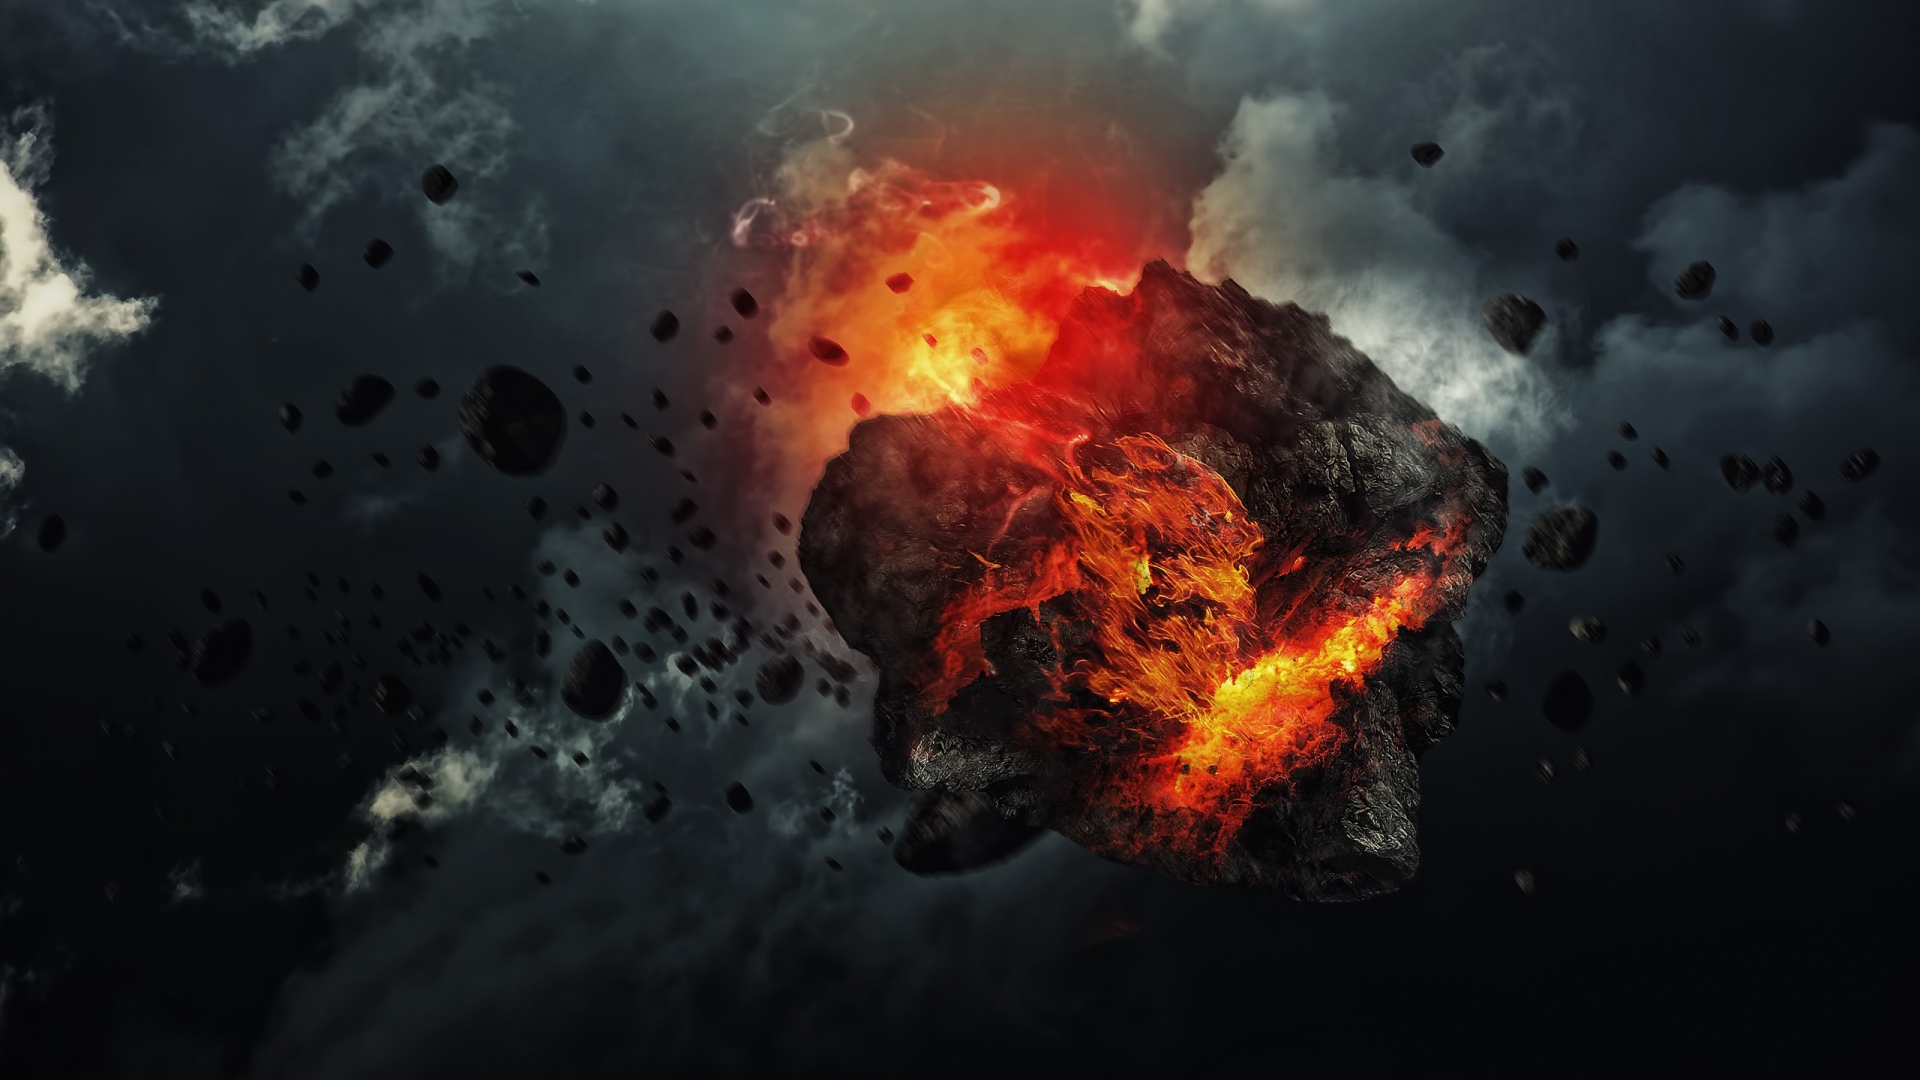 Explosion in dark sky HD Wallpaper 10944 1920x1080